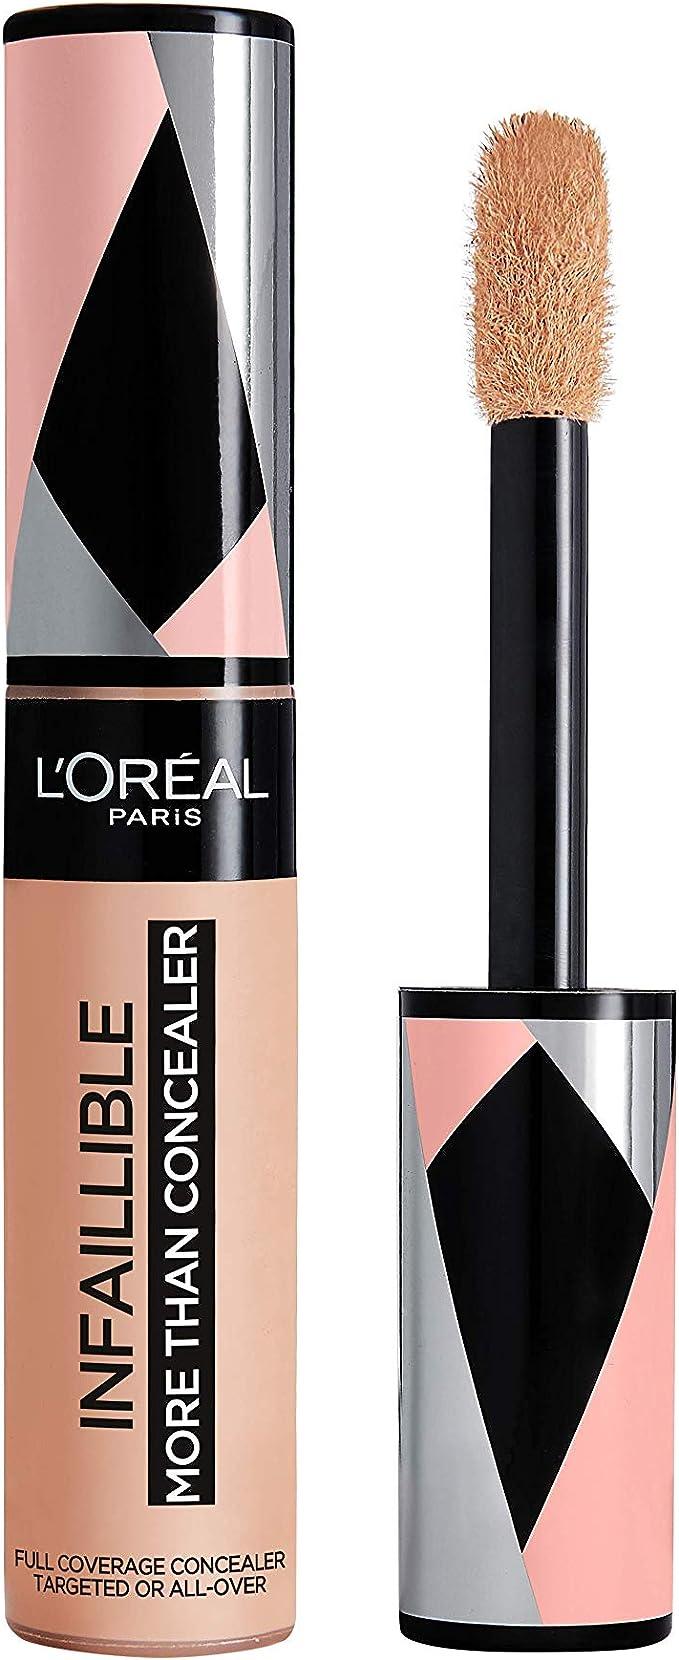 LOreal Paris Infalible More Than Concealer, Corrector Cobertura Completa, Tono 327 Cashmere - 11 ml